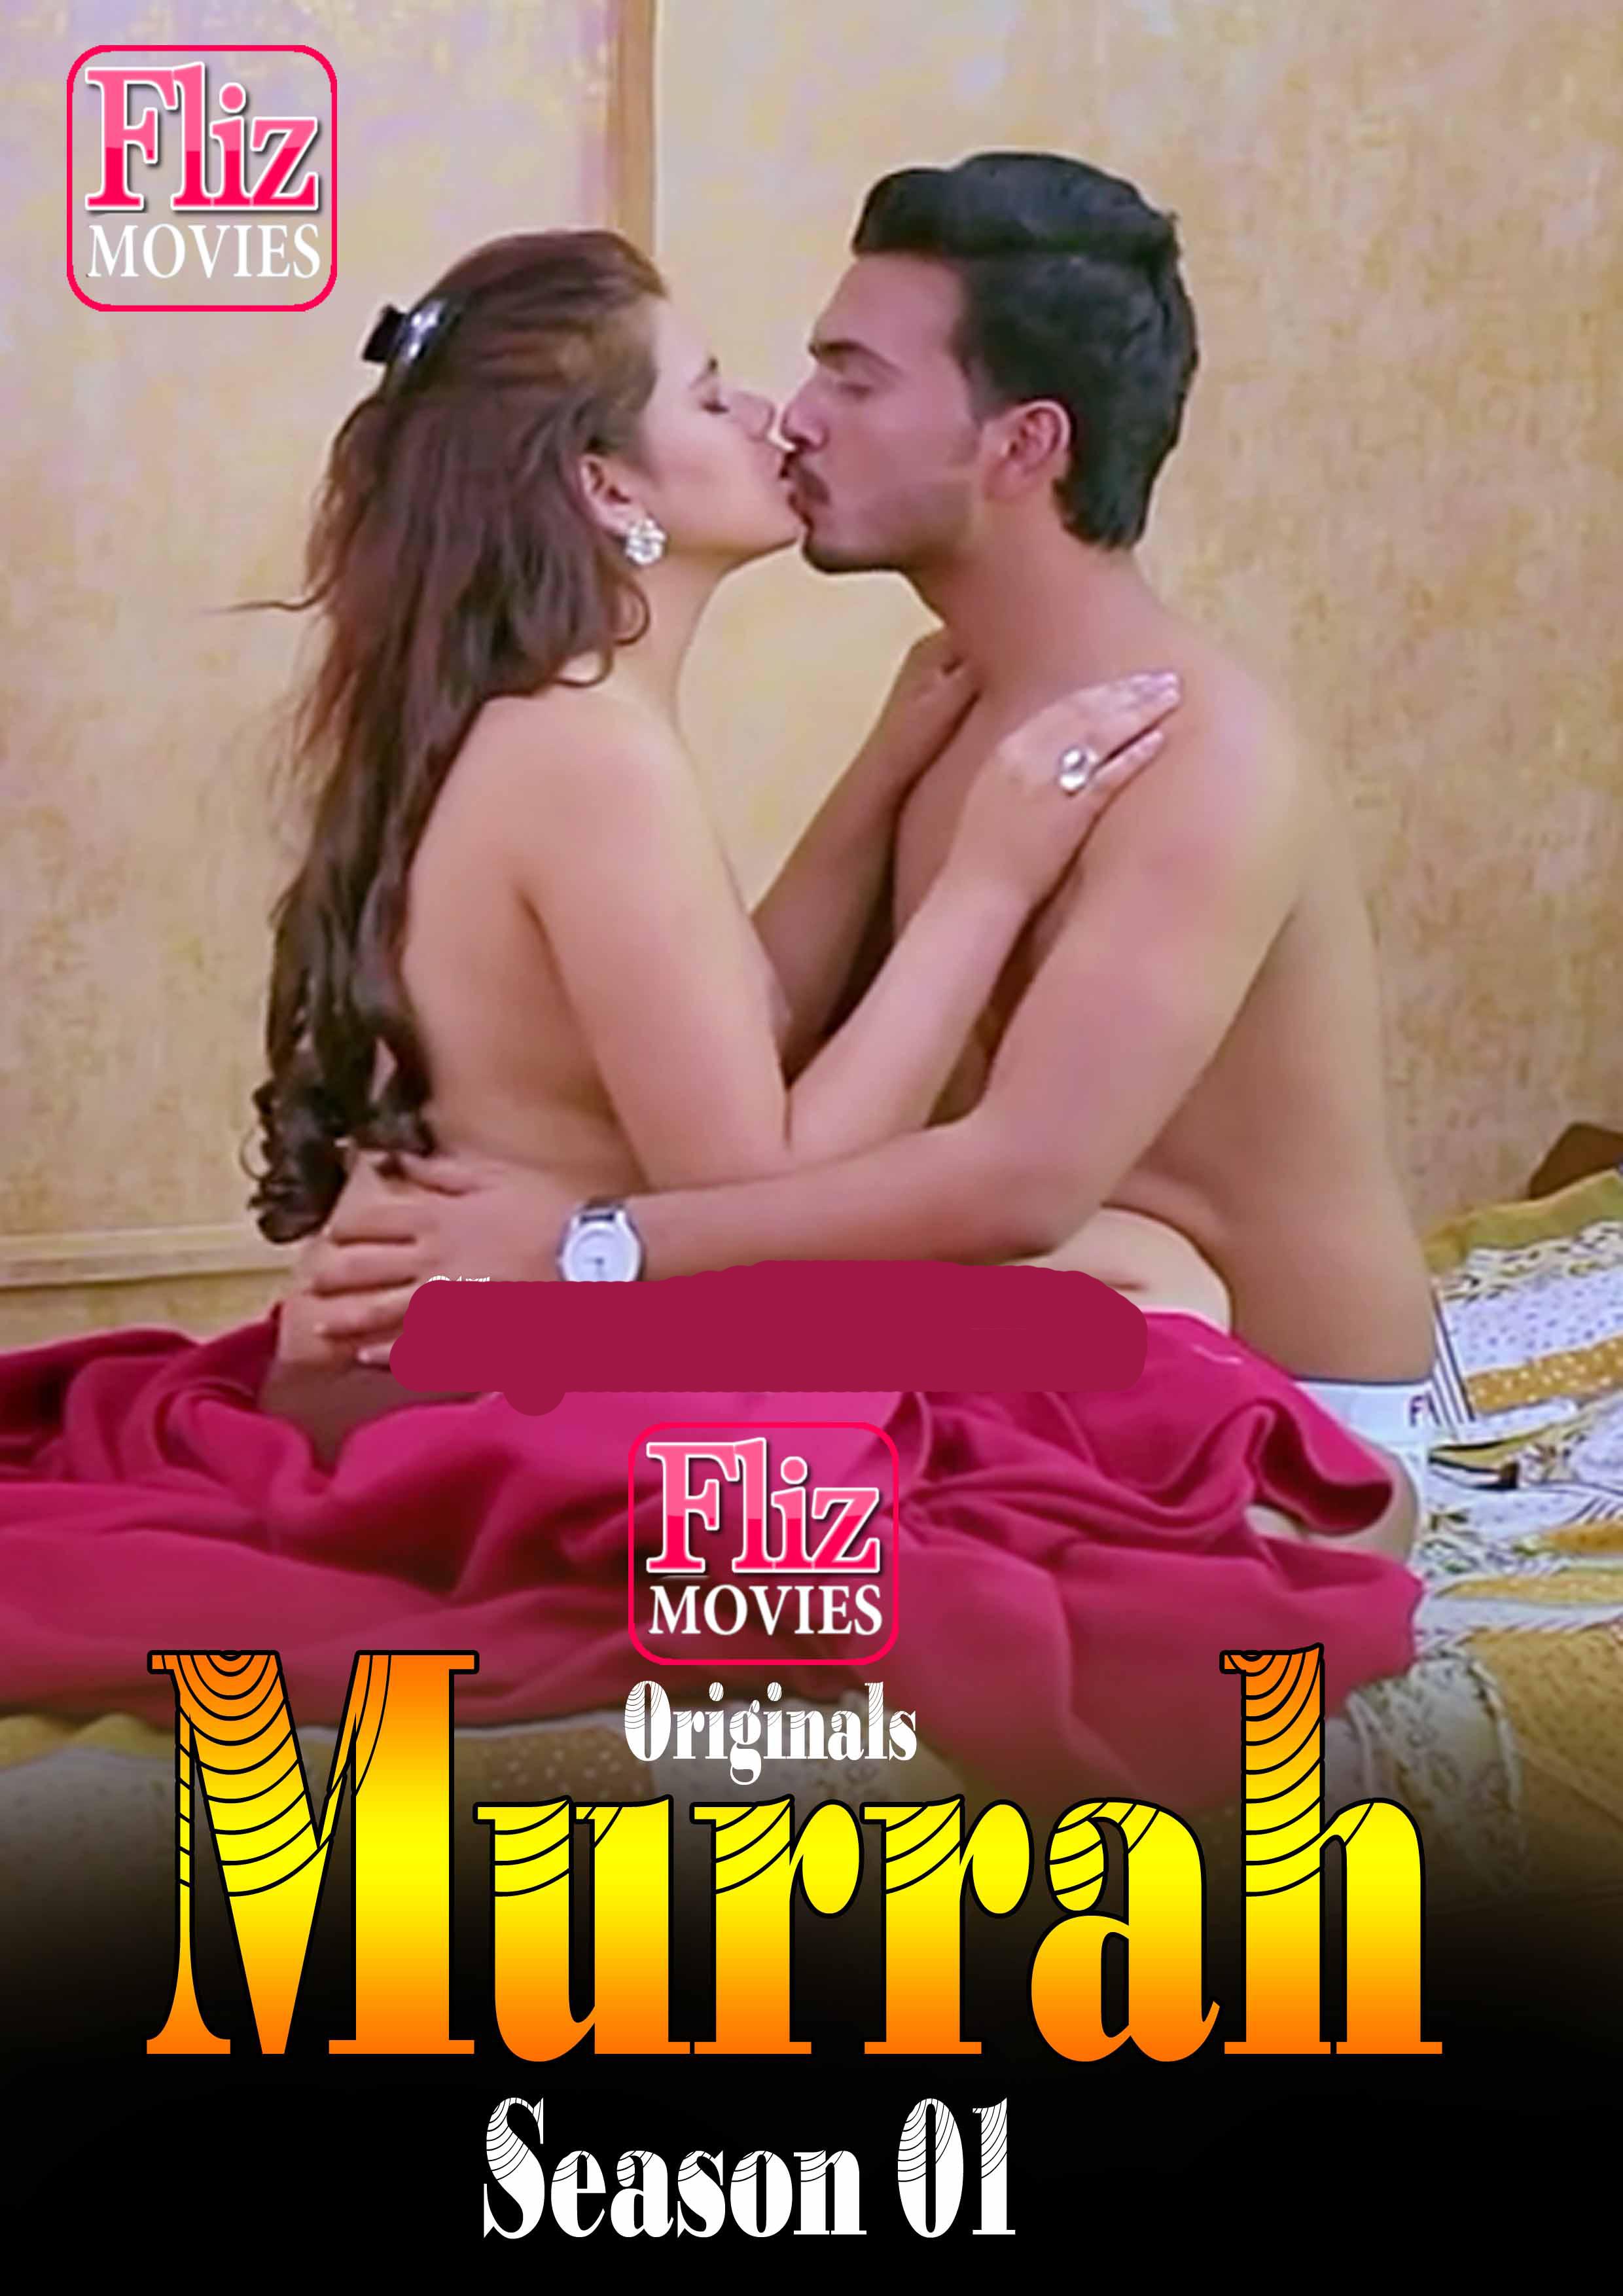 18+Murrah 2020 S01E02 Hindi Flizmovies Web Series 720p HDRip 230MB Watch Online